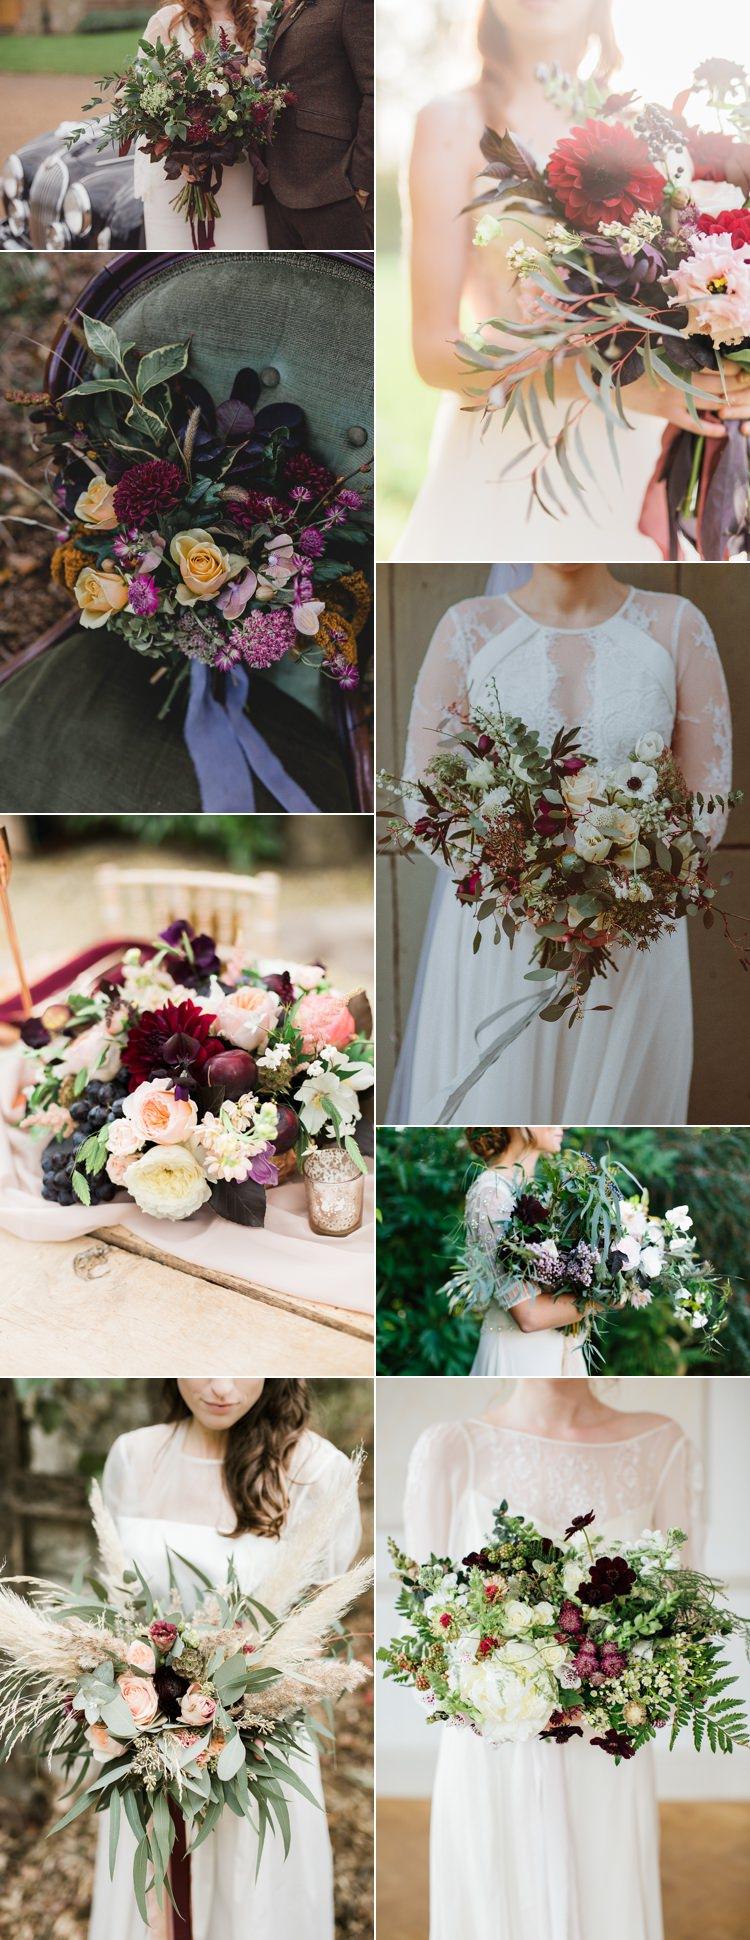 Oxblood Wedding Flowers Bouquets Trends Ideas Burgundy